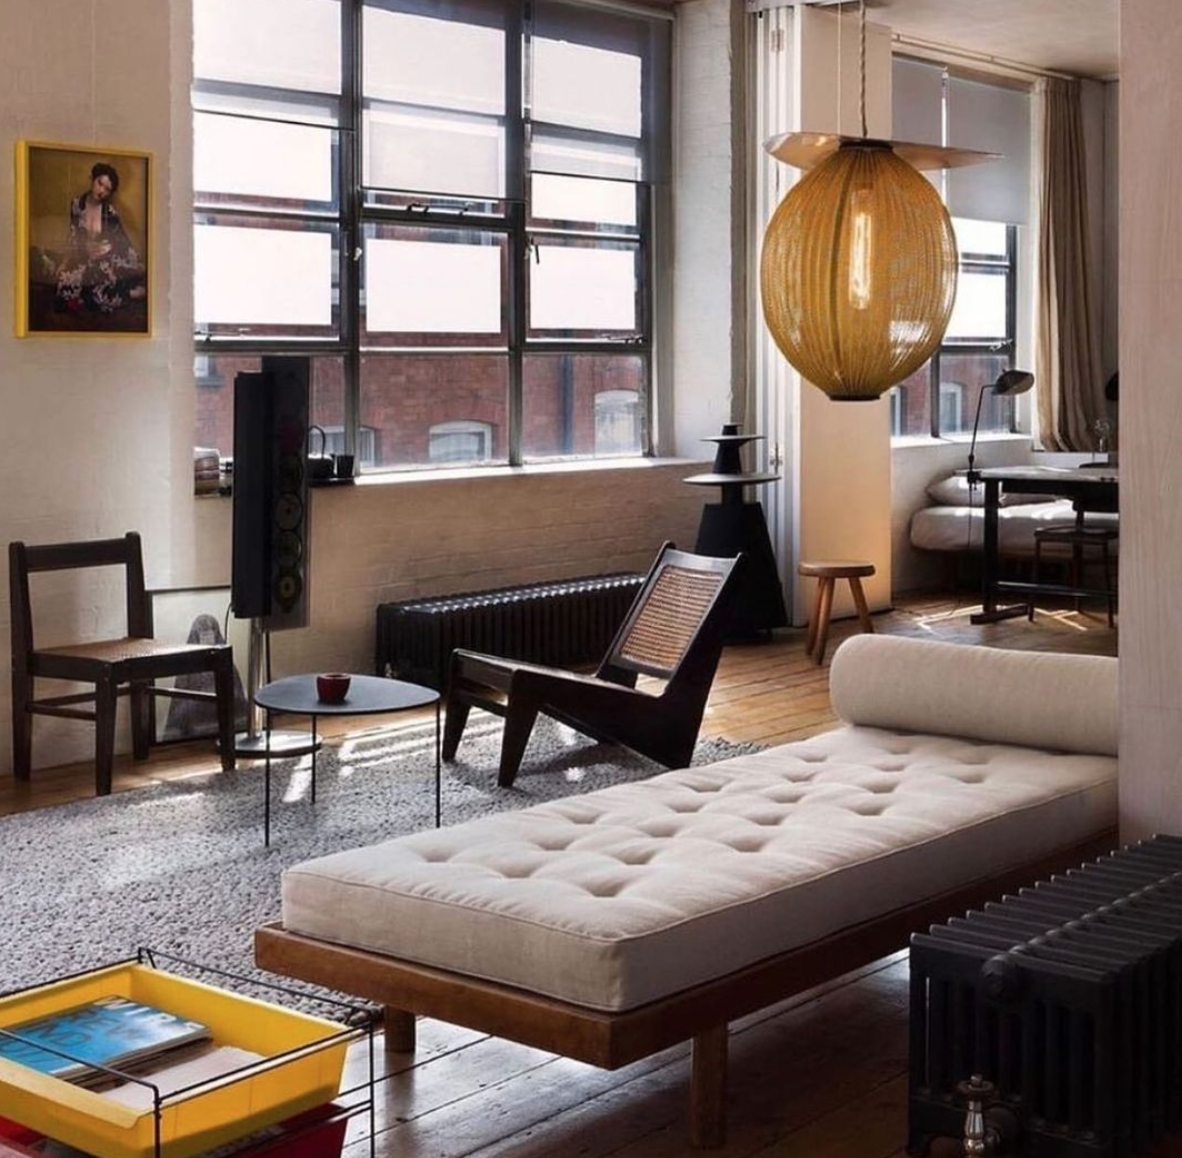 #interiors #interiordesign #design #frenchmodernism #midcenturymodern #architecture #homedecor #decor #lifestyle #instadaily #inspiration #pierrejeanneret #charlotteperriand #jeanprouve #lecorbusier